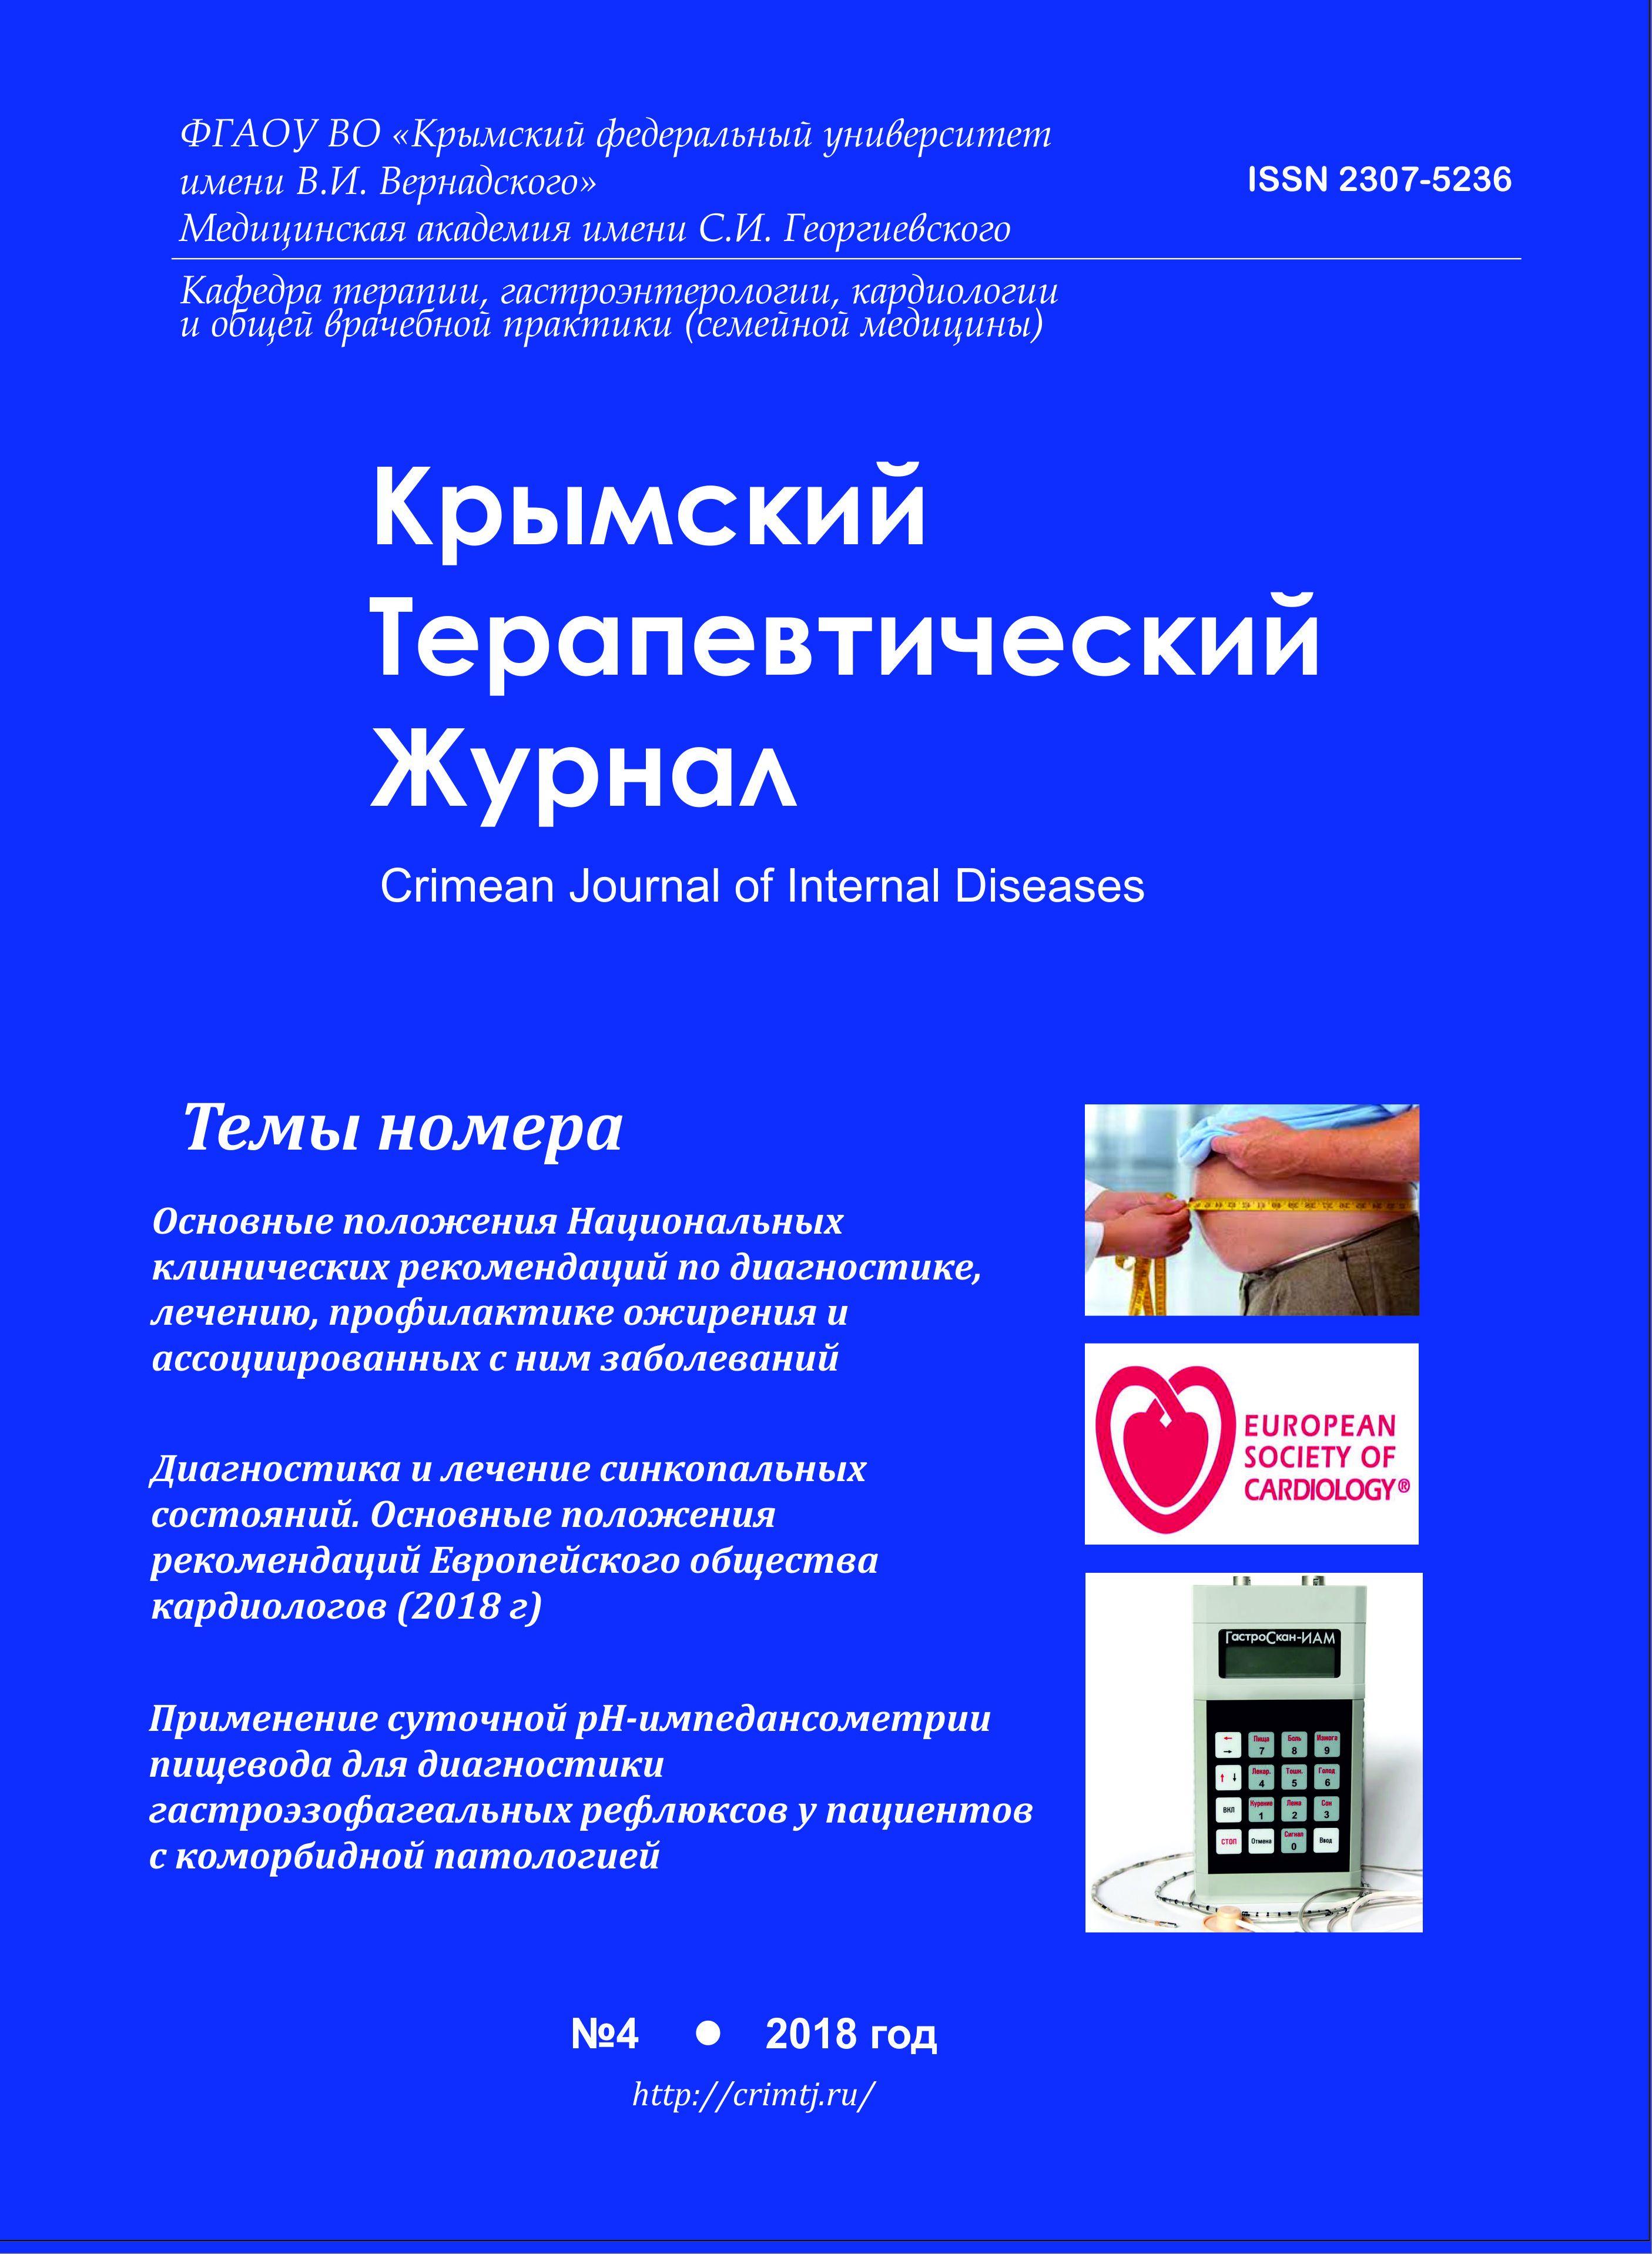 97bc59ffbd97 Англоязычная версия сайта нашего журнала находится здесь  Crimean Journal  of Internal Diseases